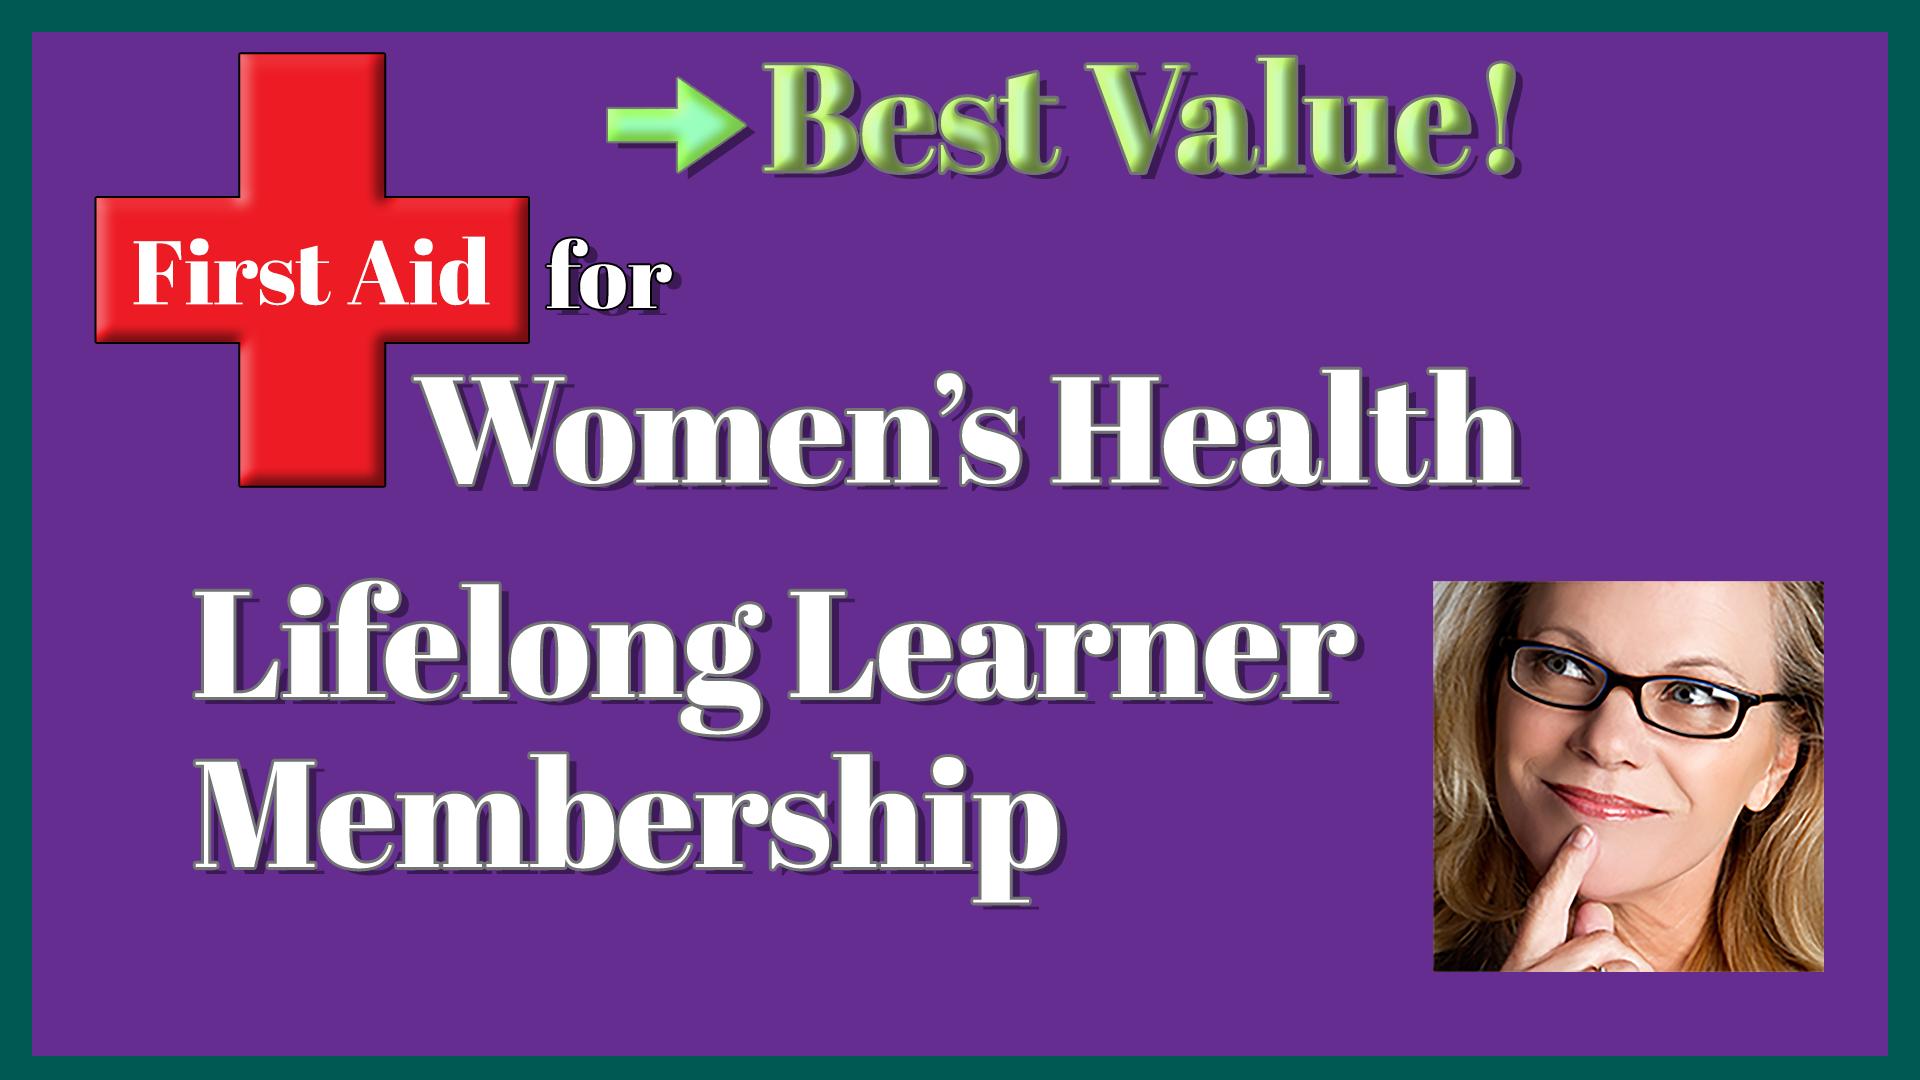 Lifelong Learner Membership